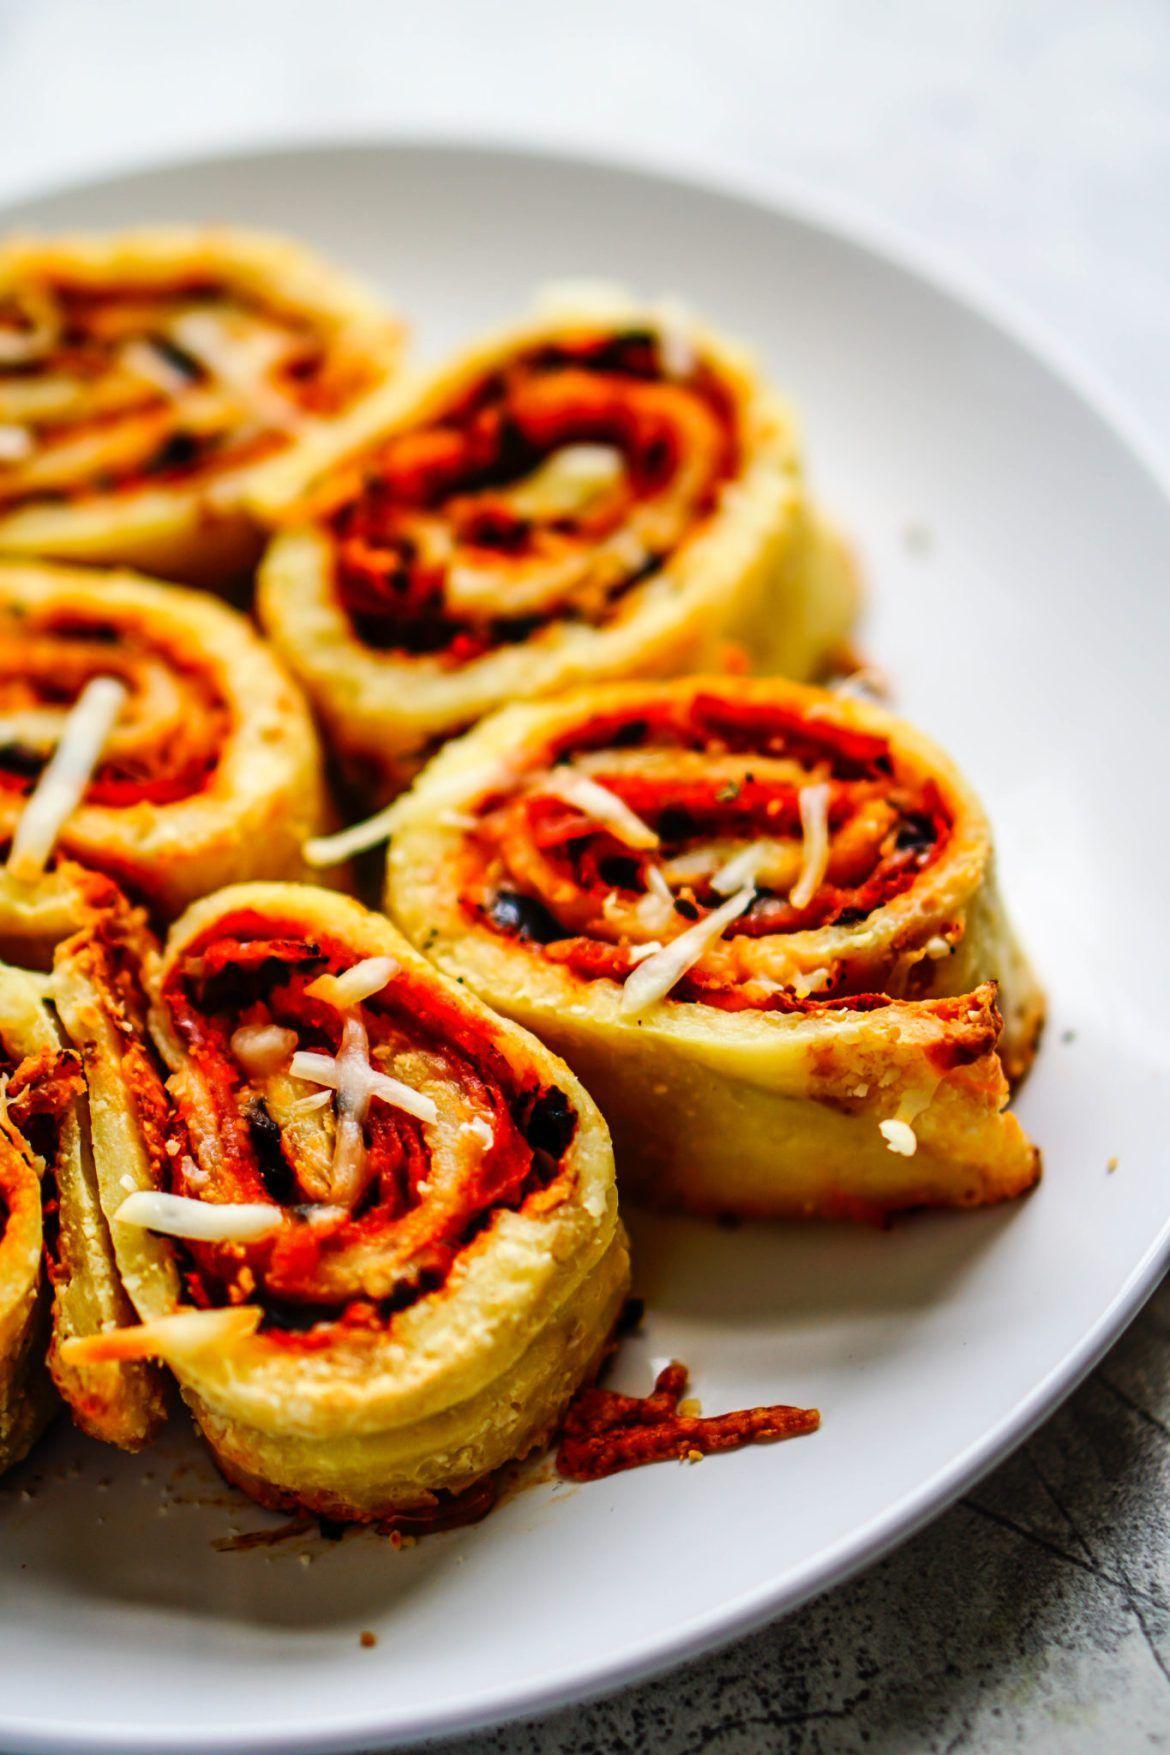 Fathead pizza rolls low carb gluten free keto